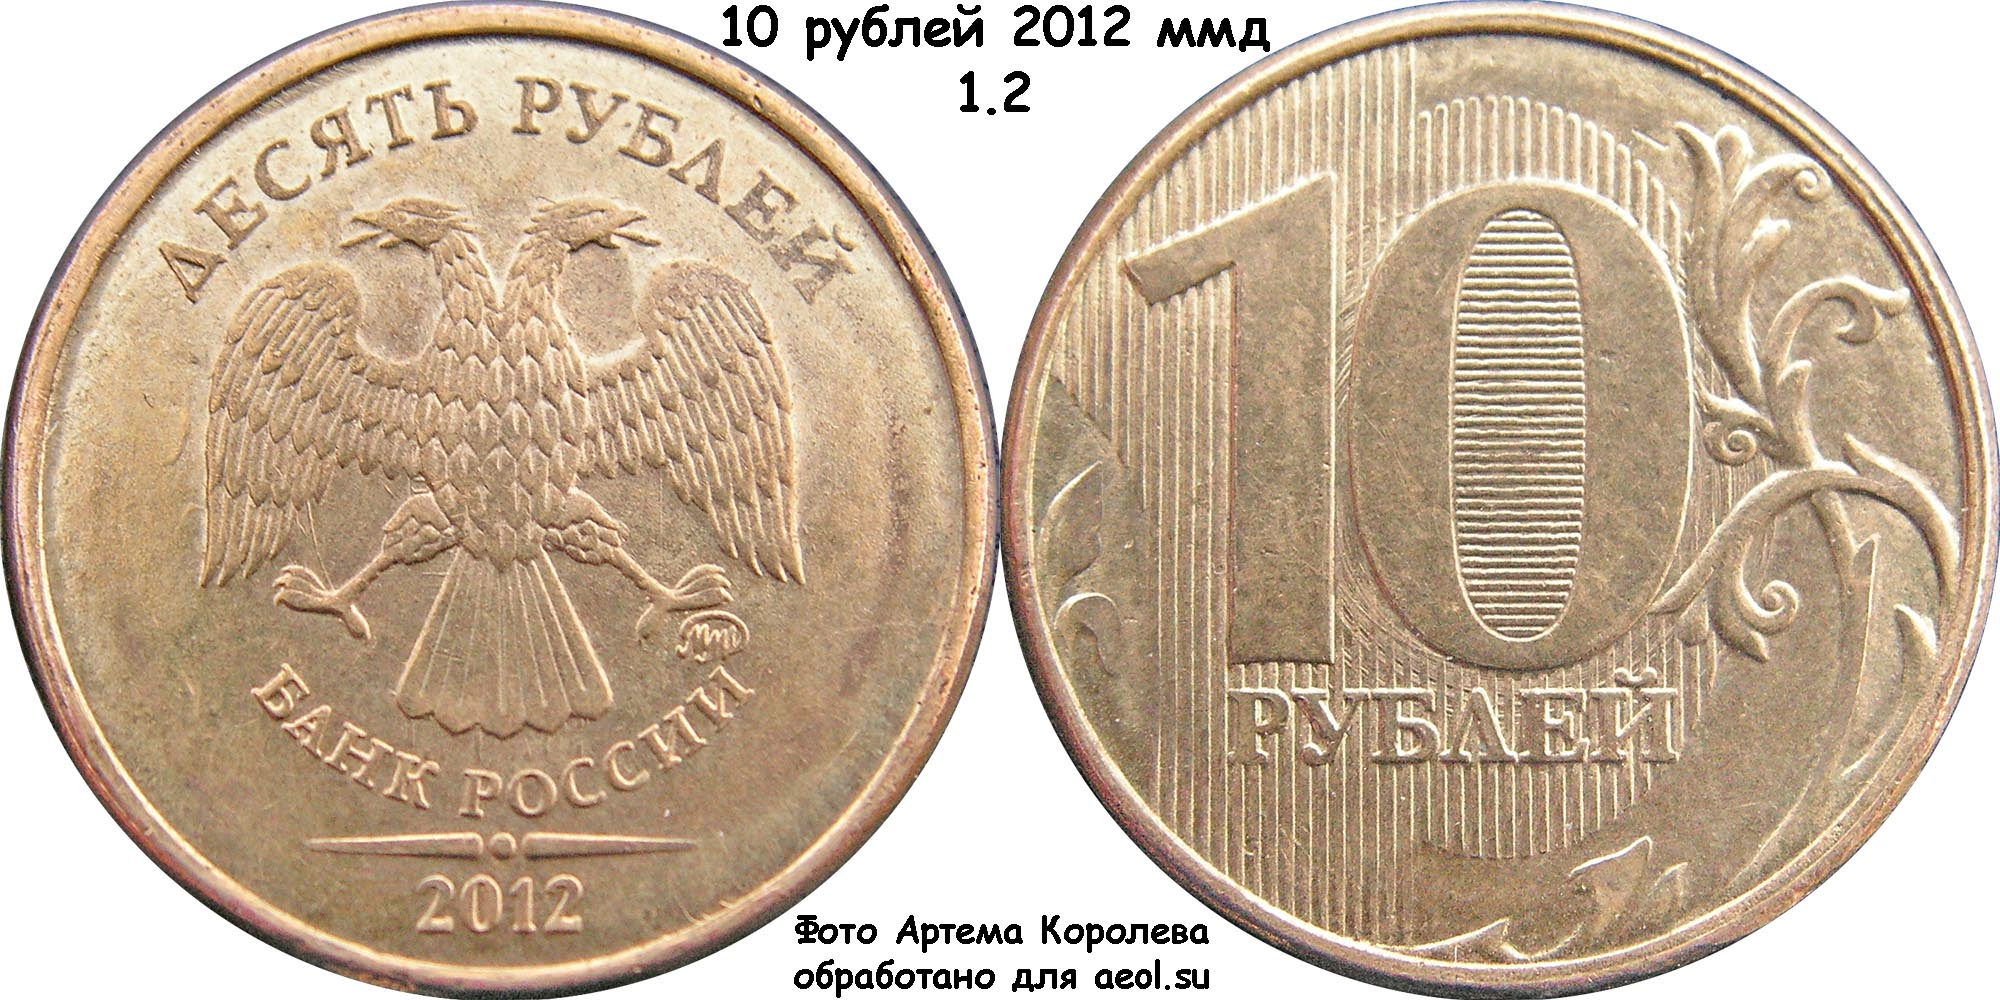 10 рублей биметалл размер тектиты фото